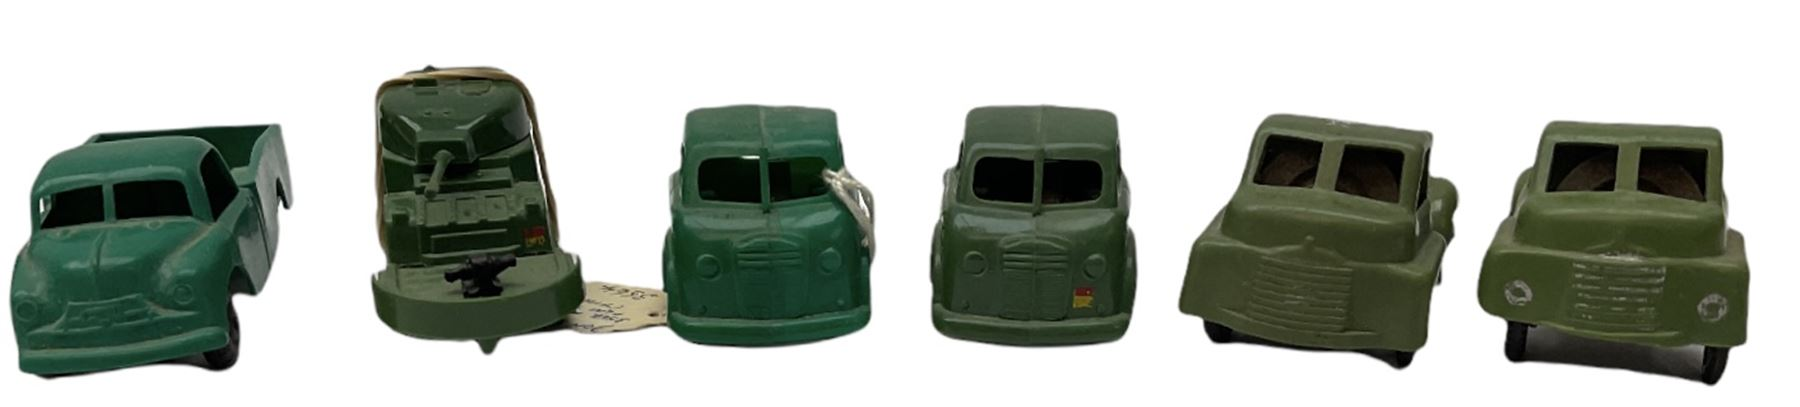 Tri-ang/Tri-ang Minic - twelve plastic friction-drive vehicles comprising Tri-ang Toys/Pedigree Pram - Image 3 of 7